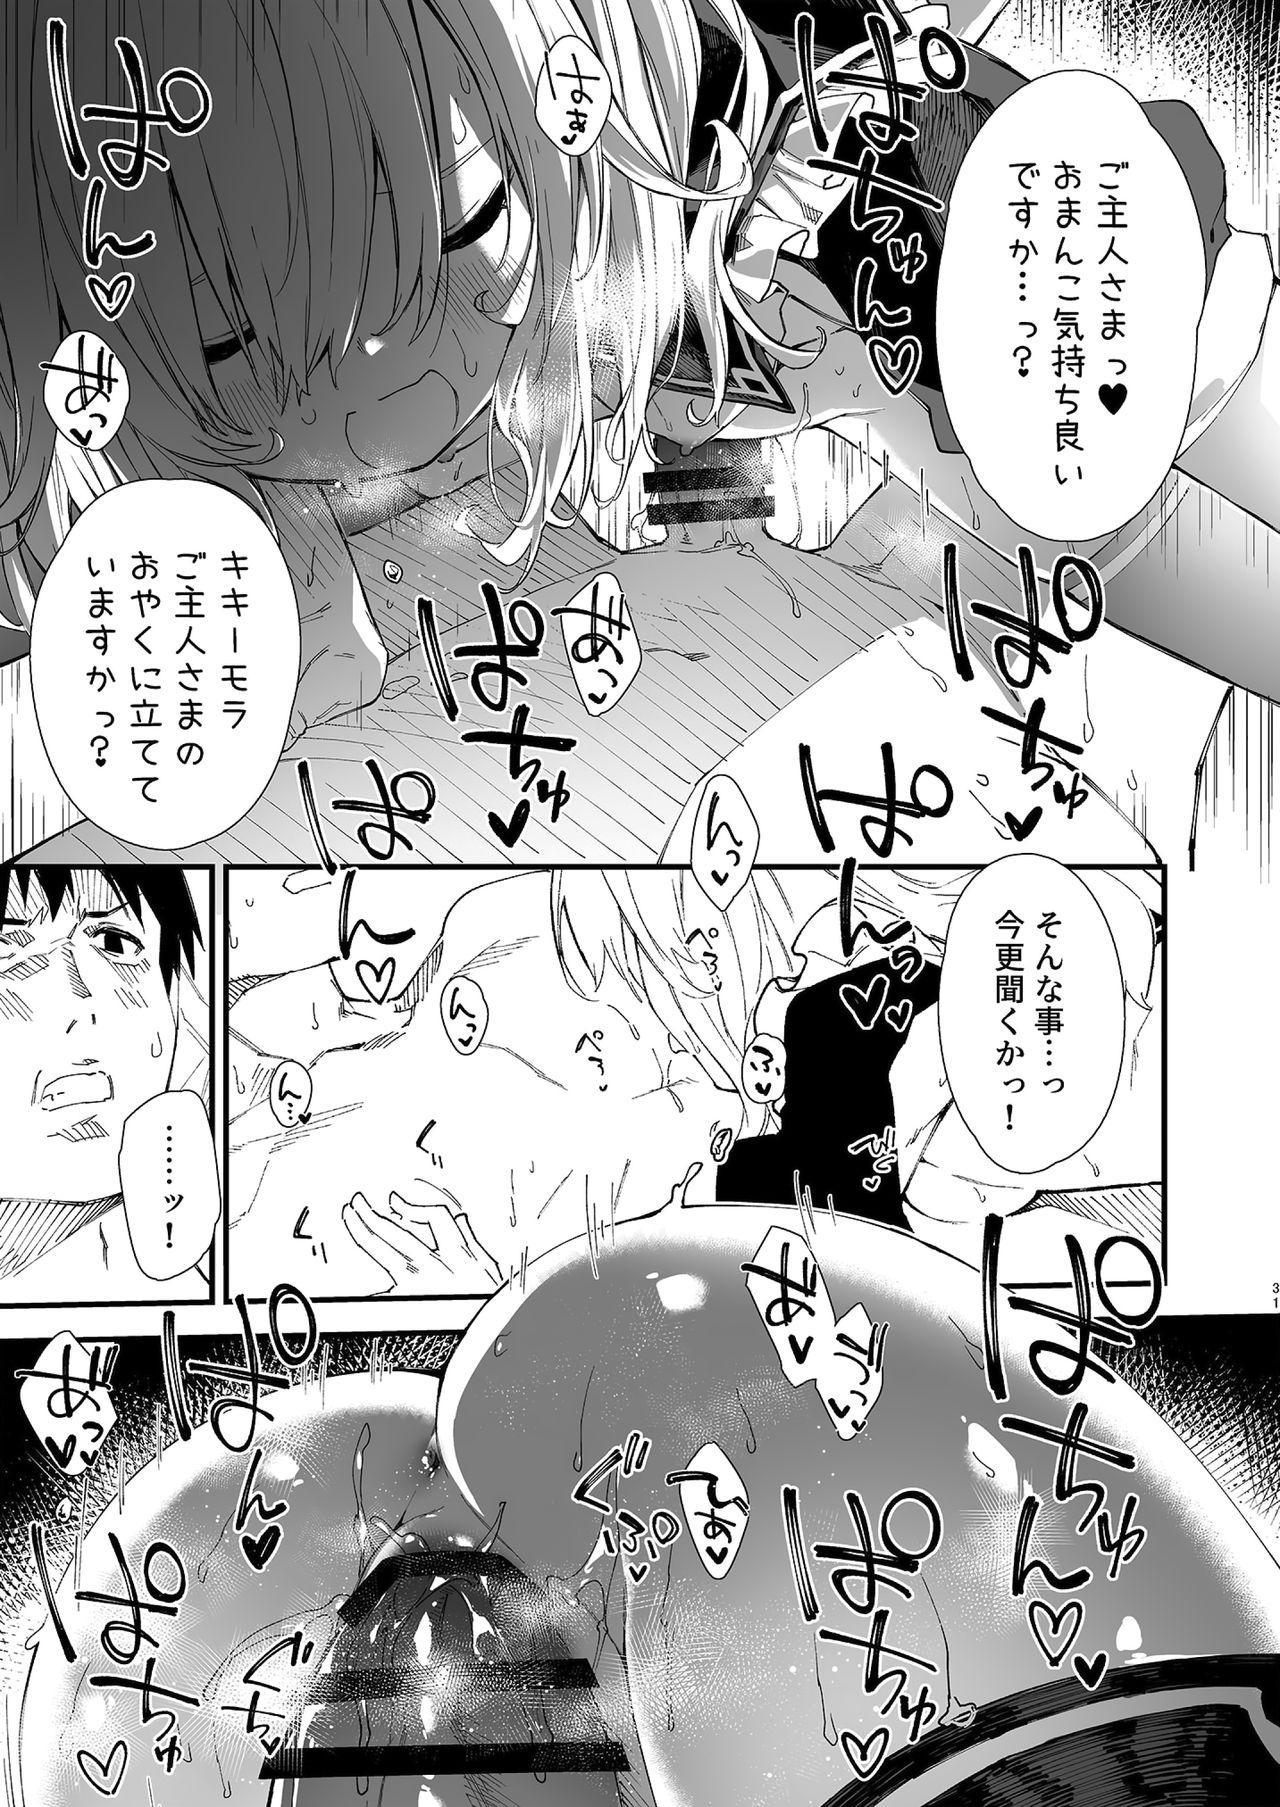 Kemomimi Maid to Ichaicha suru Hon 28